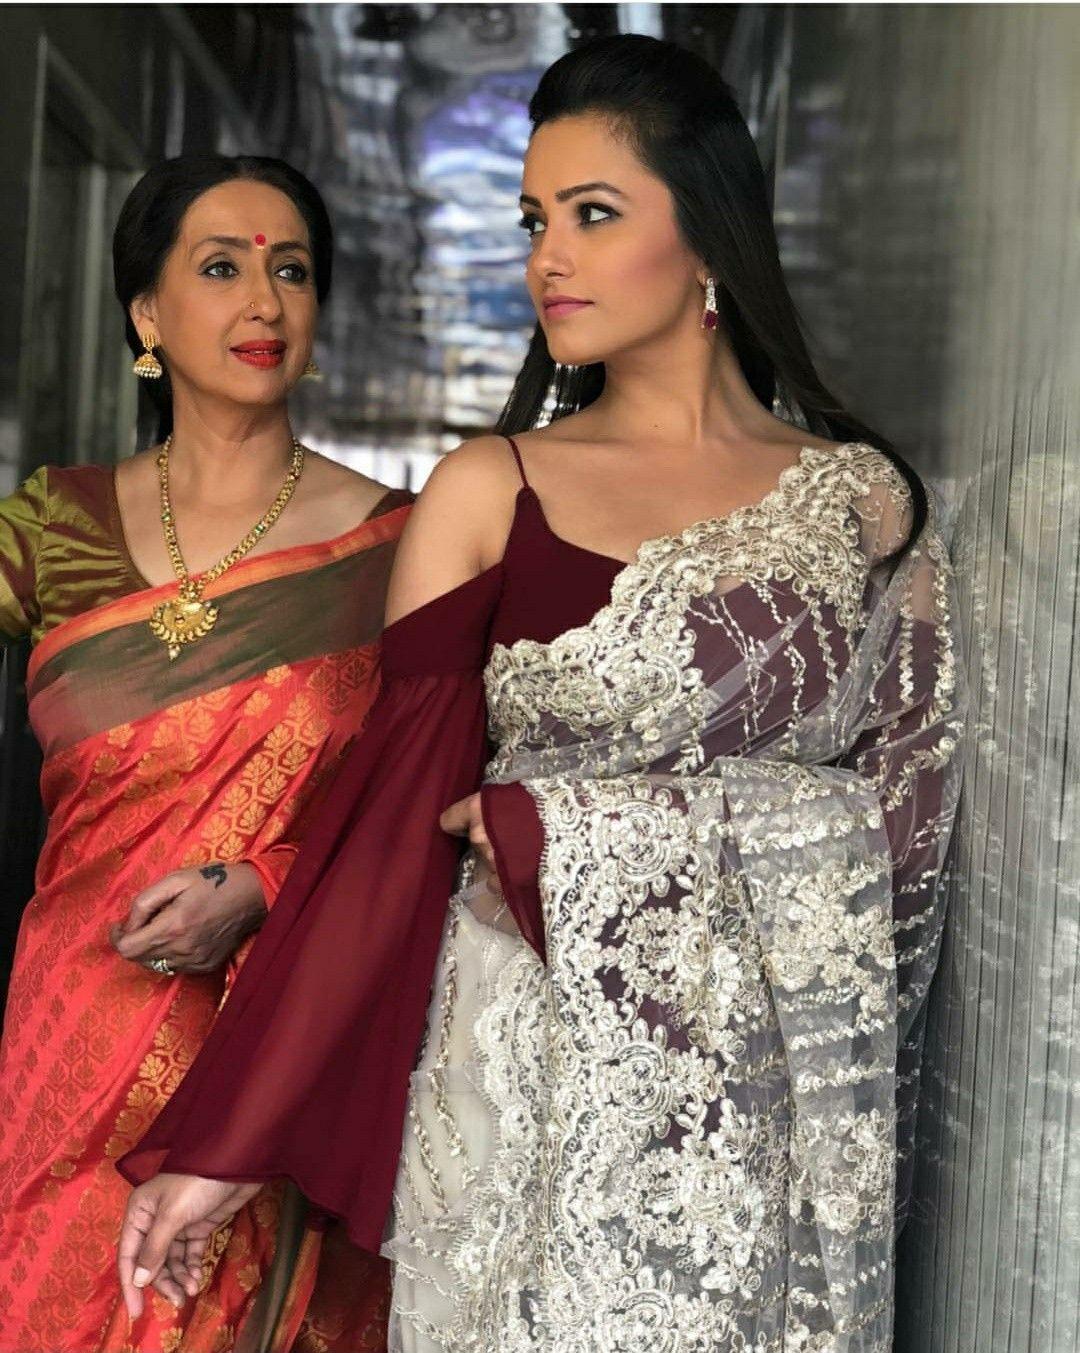 e50cbecf7451fc Maggam Work Bridal Saree Blouse Designs – South India Fashion